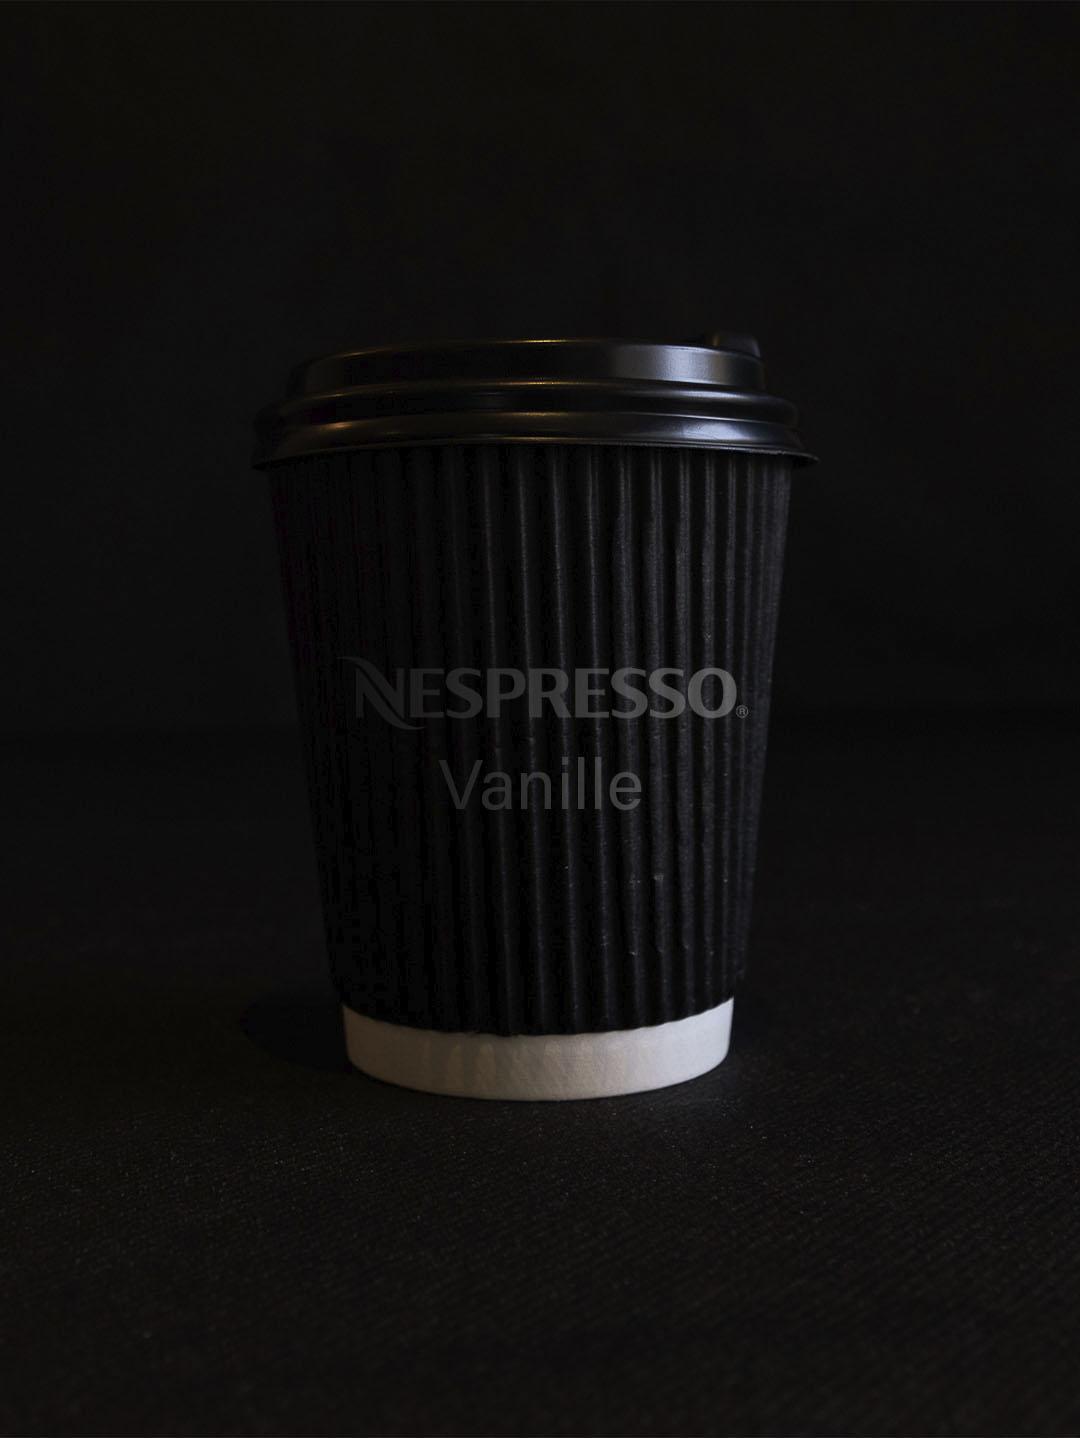 Nespresso vanille coeur gourmand